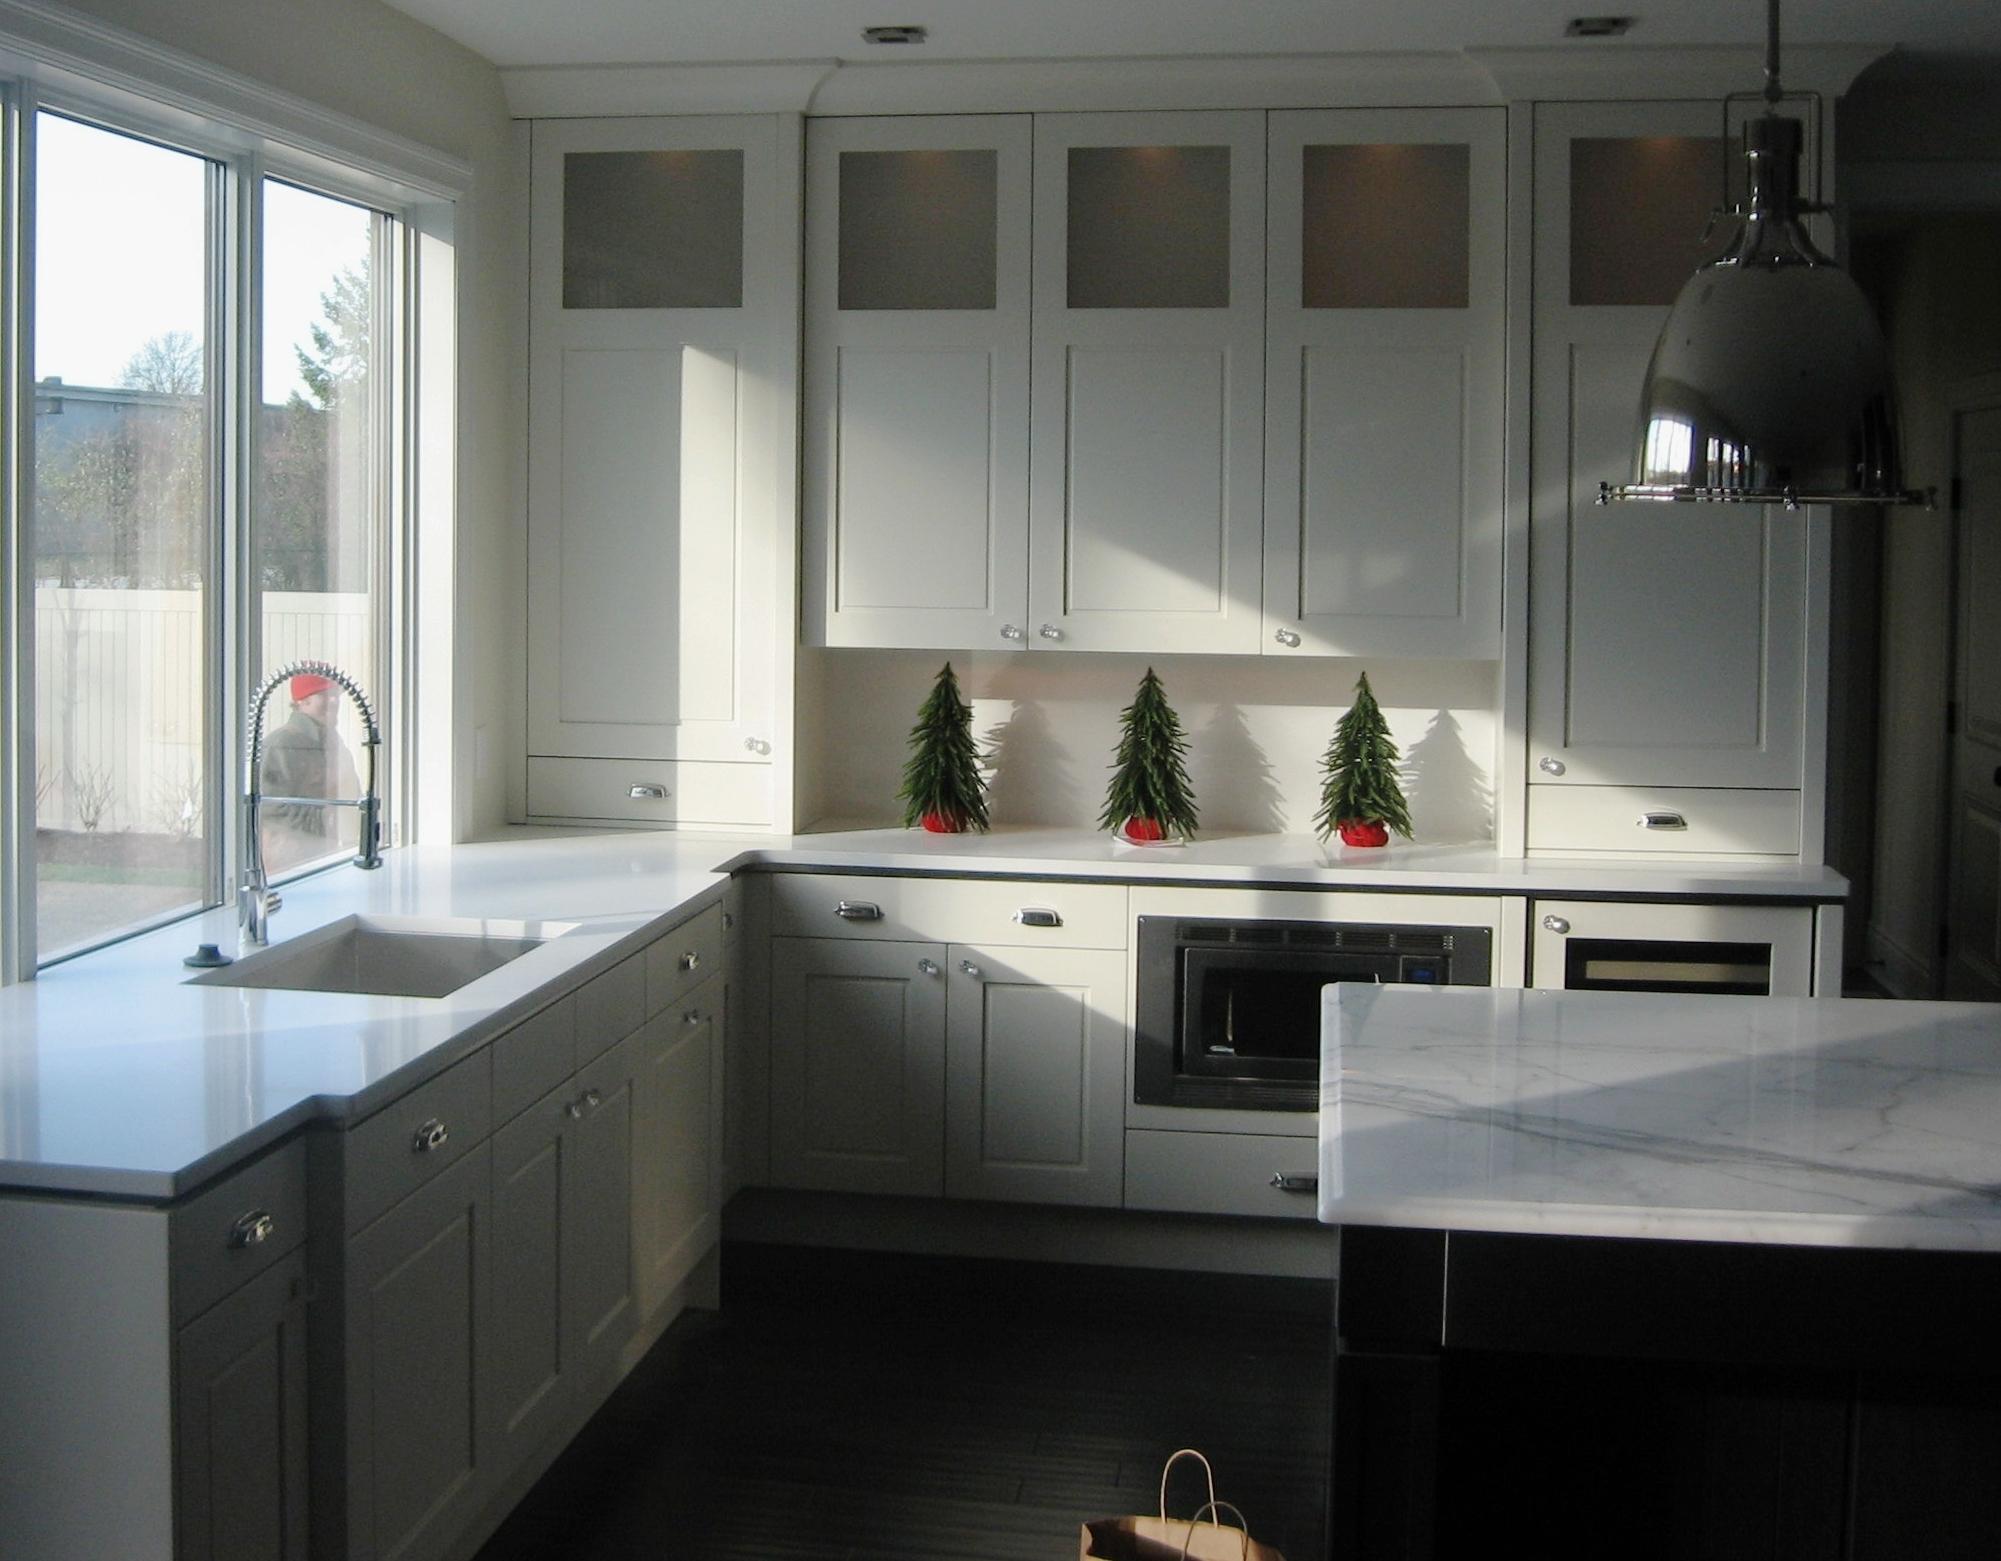 Kitchen Carrara Marble countertop island quartz countertop Woodlook tile floor modern ideas inspiration.jpg